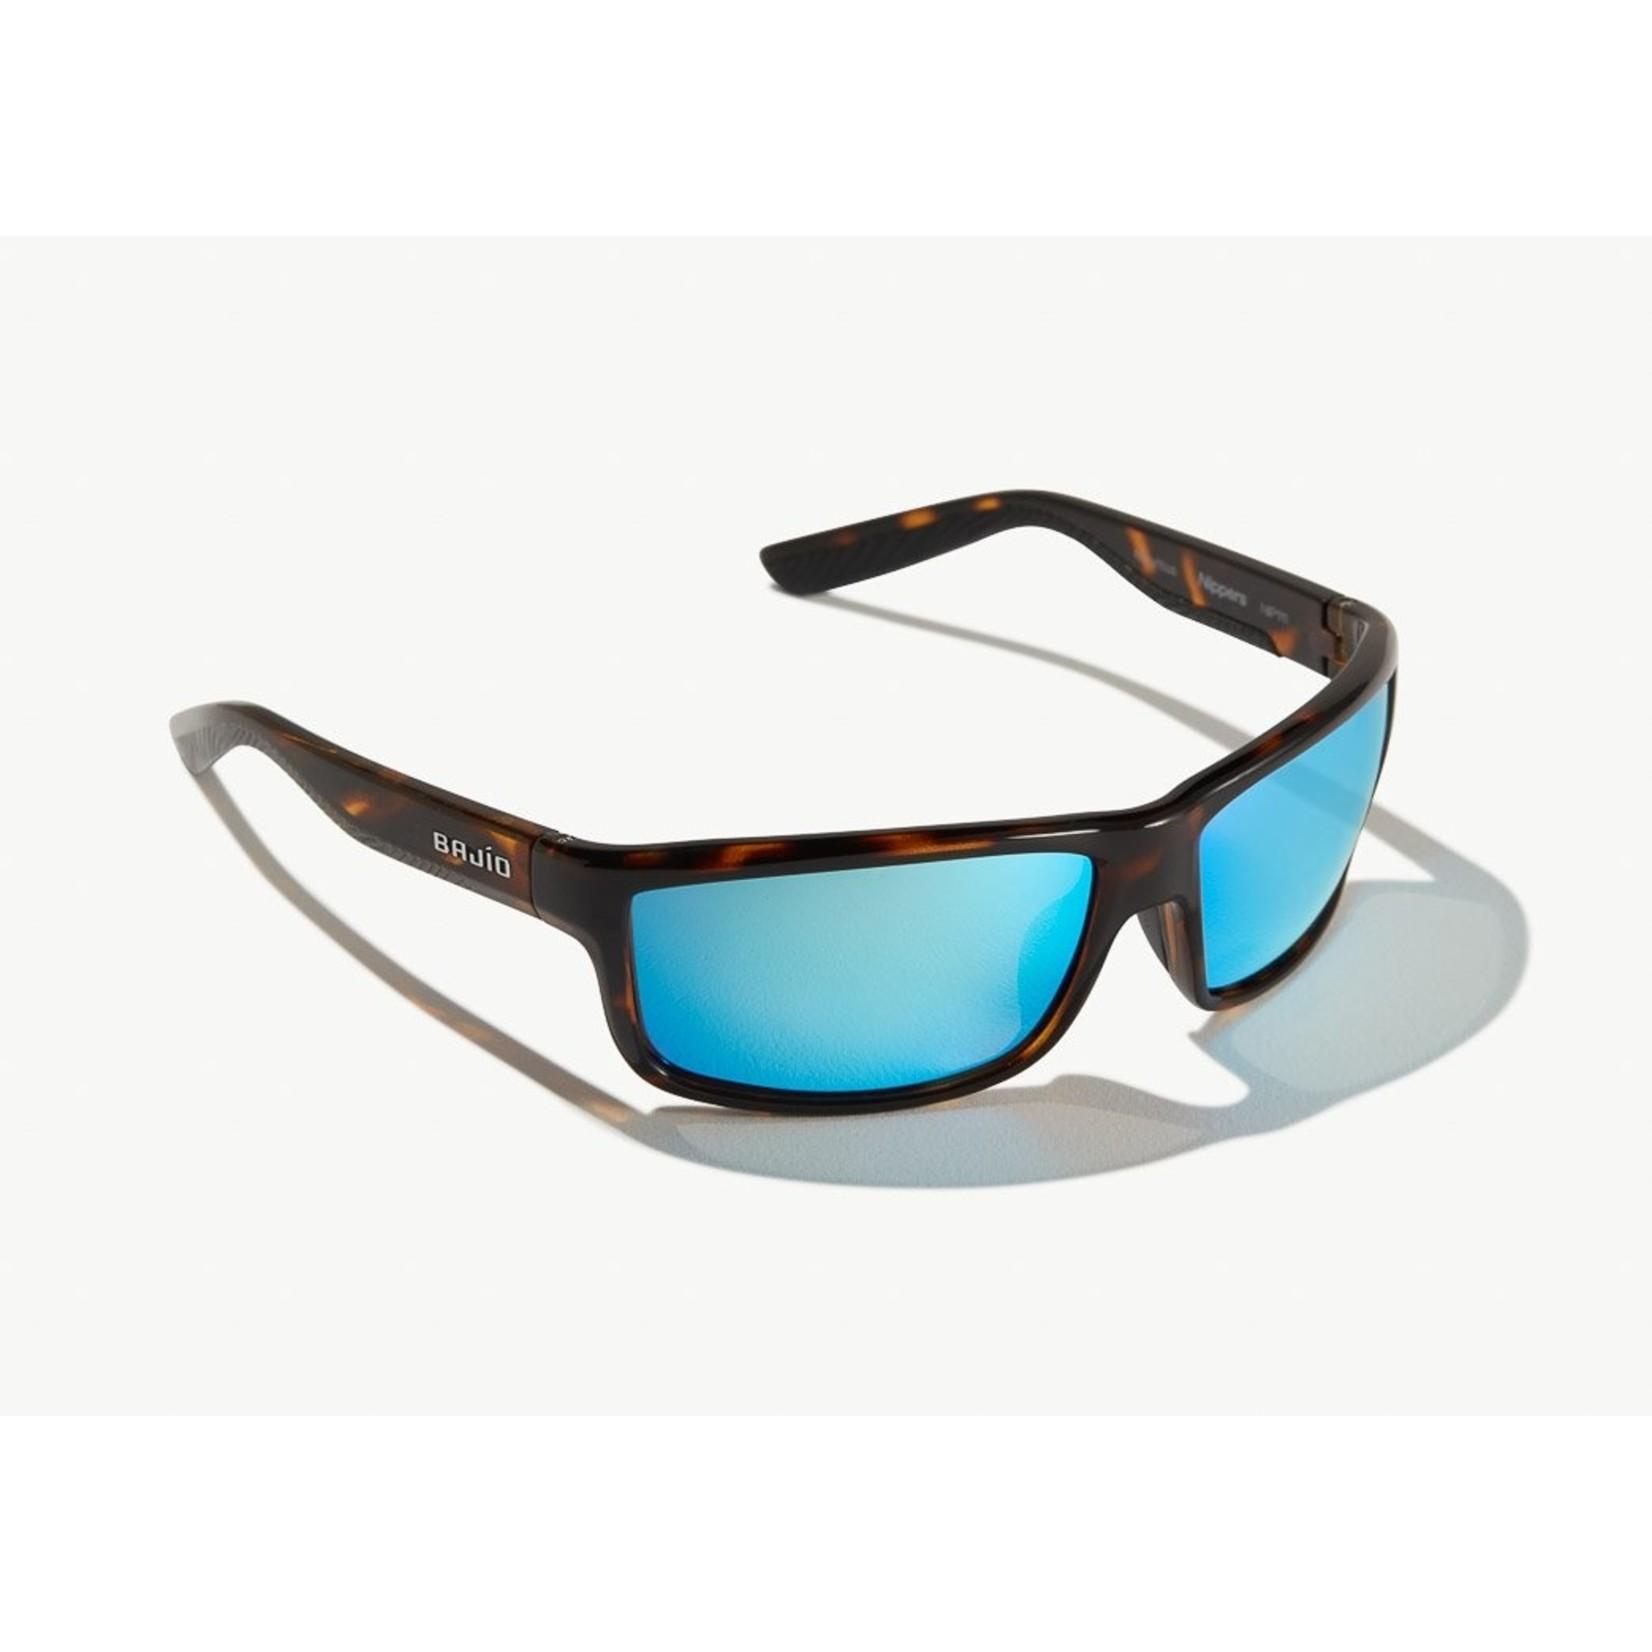 Bajio Bajio Nippers Polarized Sunglasses